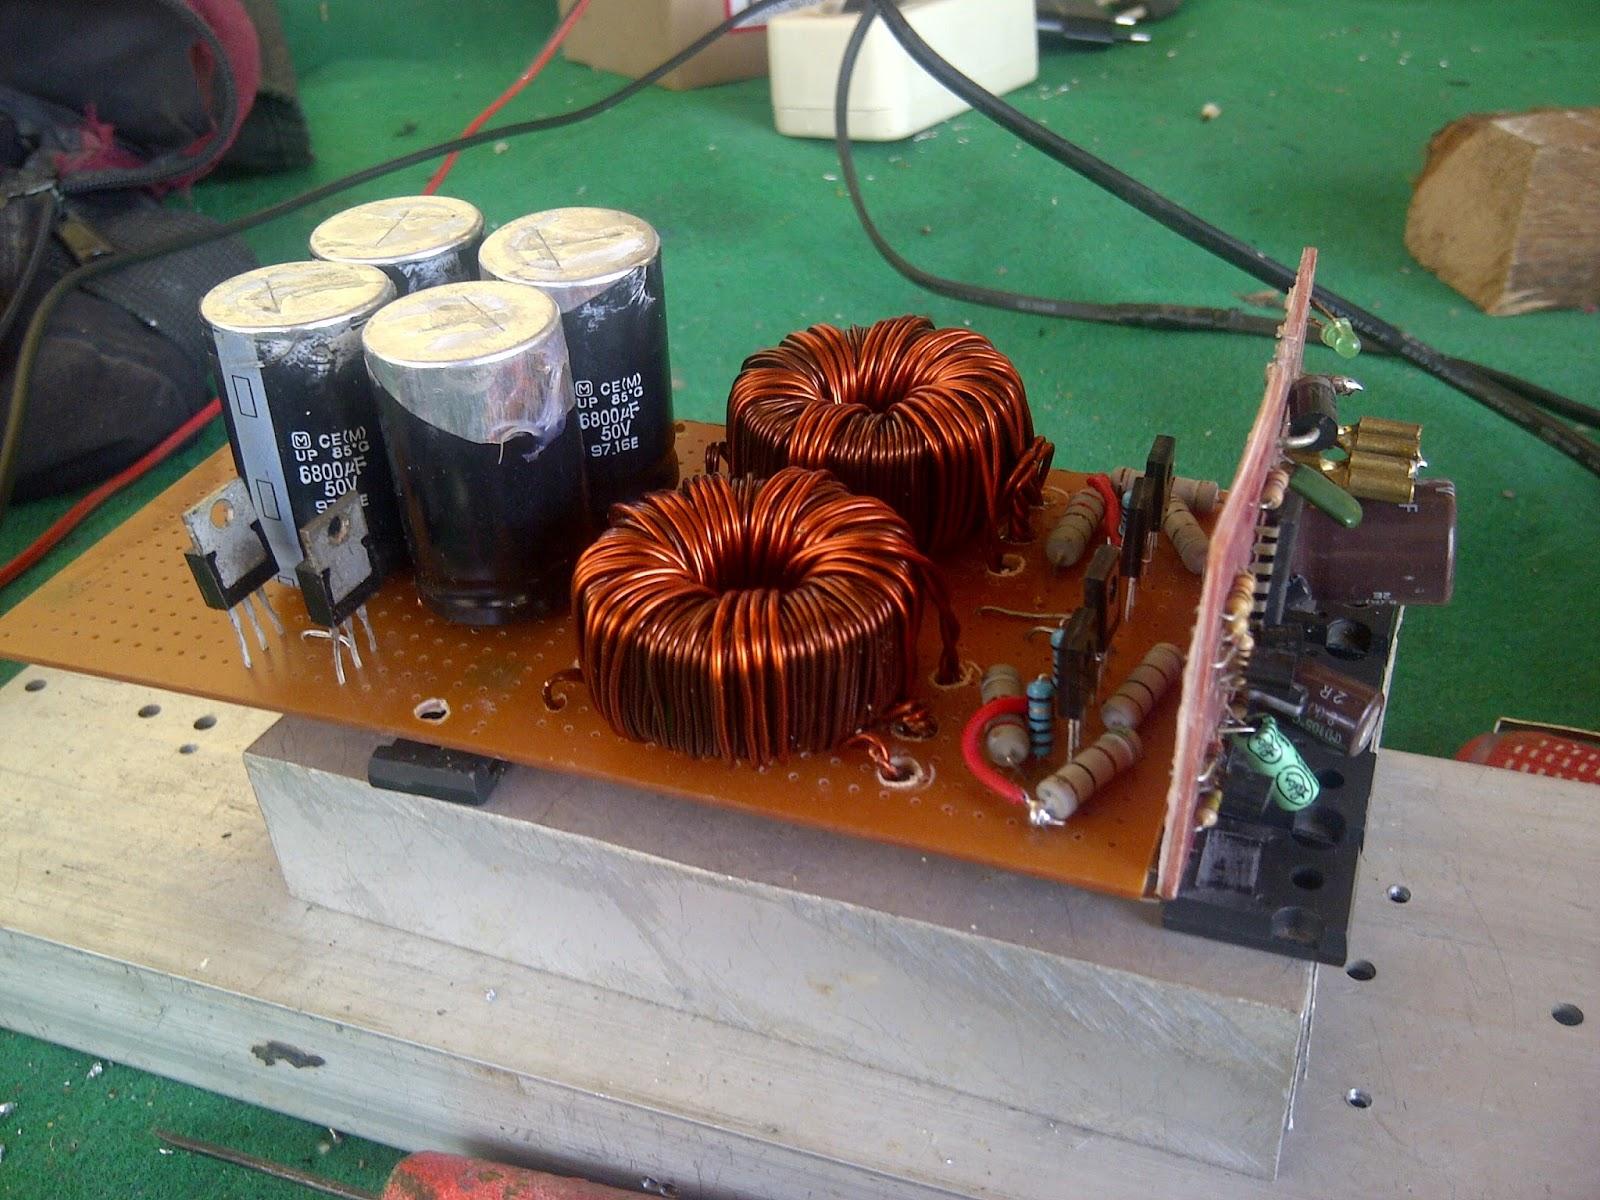 Inverter Audio Mobil Rakitan  Inverter Audio Mobil Rakitan